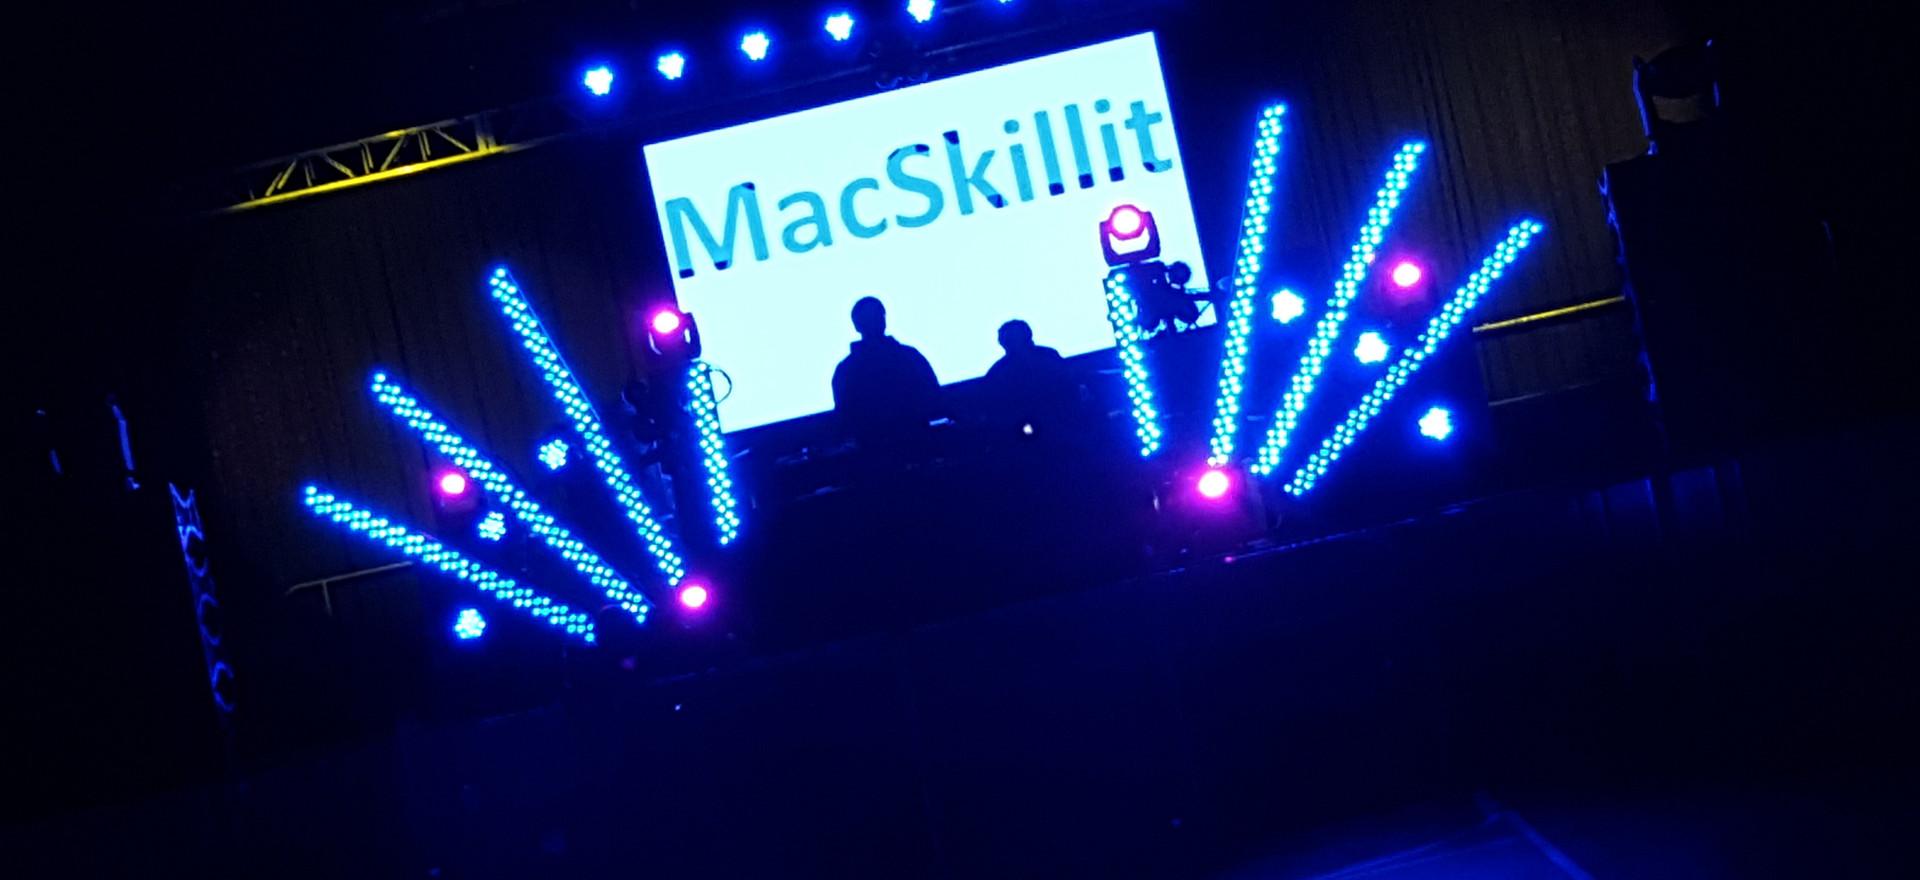 College EMD Concert with MacSkillit